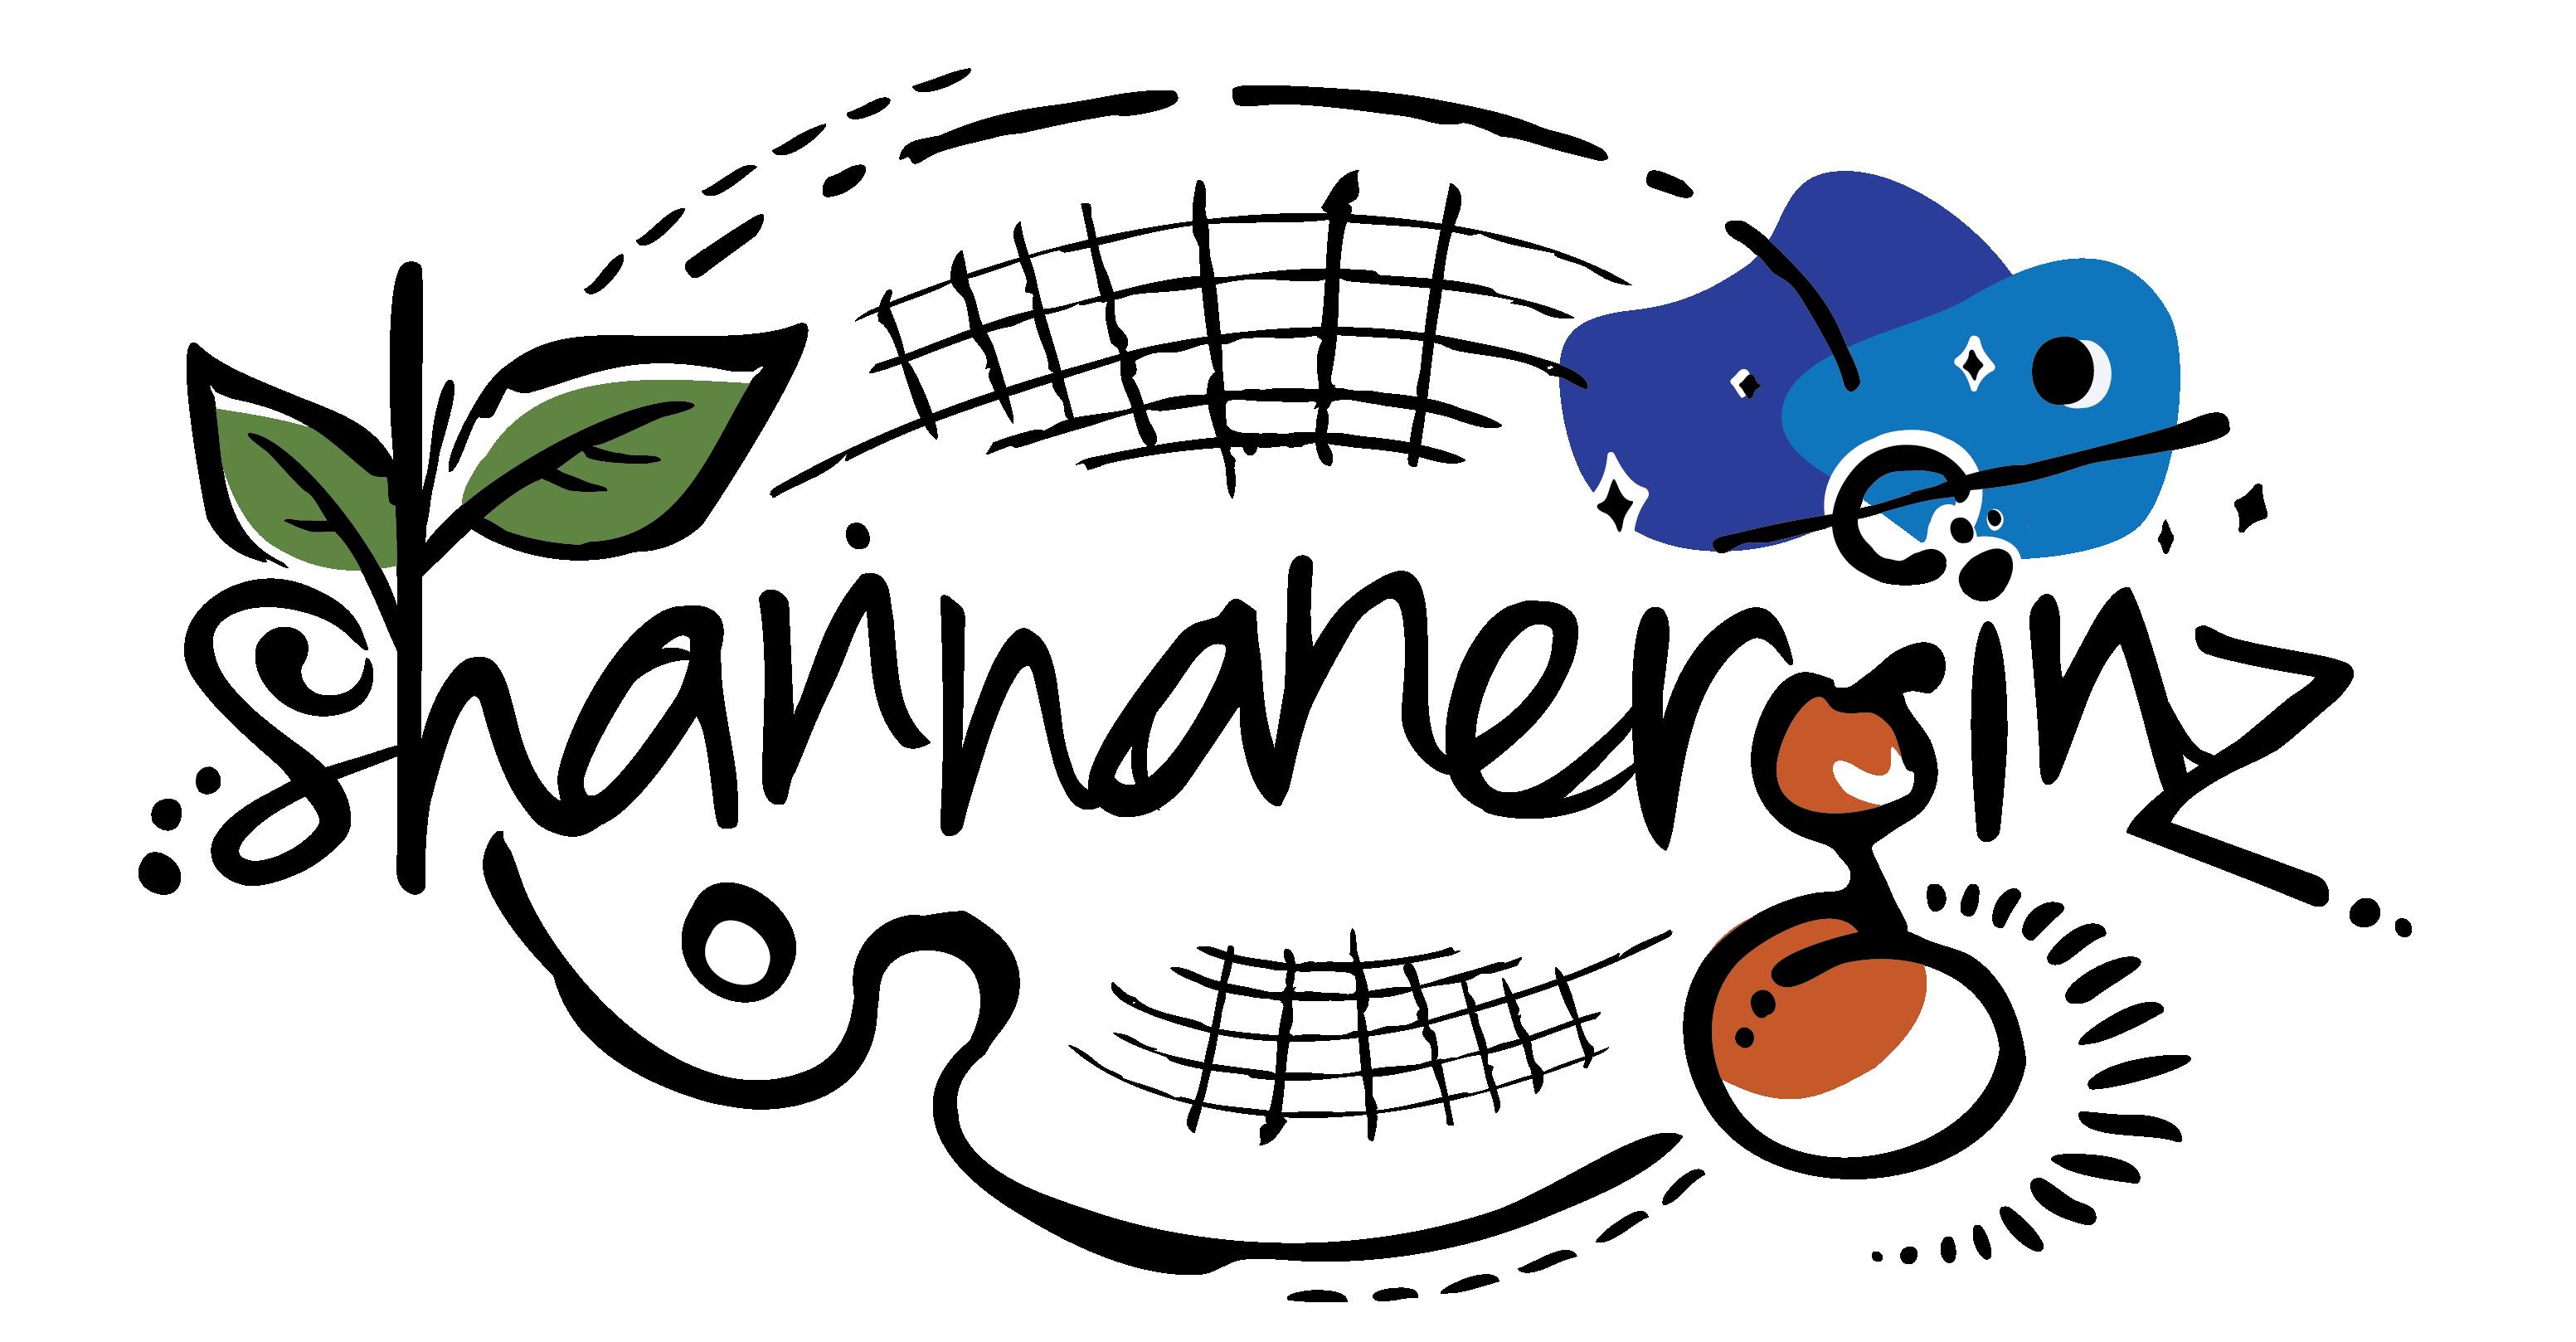 shannerginz logo